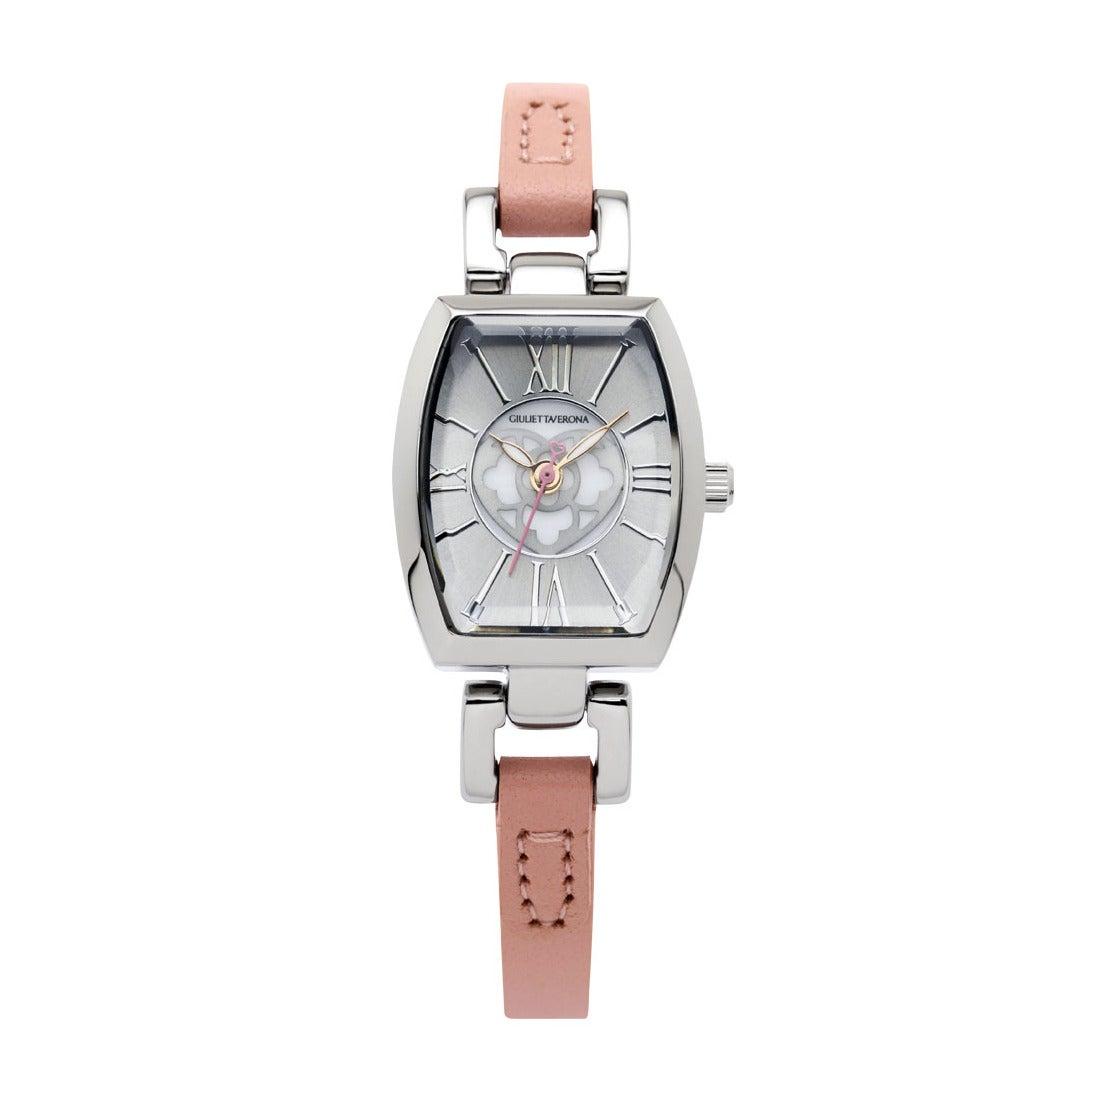 【SAC'S BAR】ジュリエッタヴェローナ GIULIETTAVERONA 腕時計 GV006 LOVE VERONA シルバー×ピンク